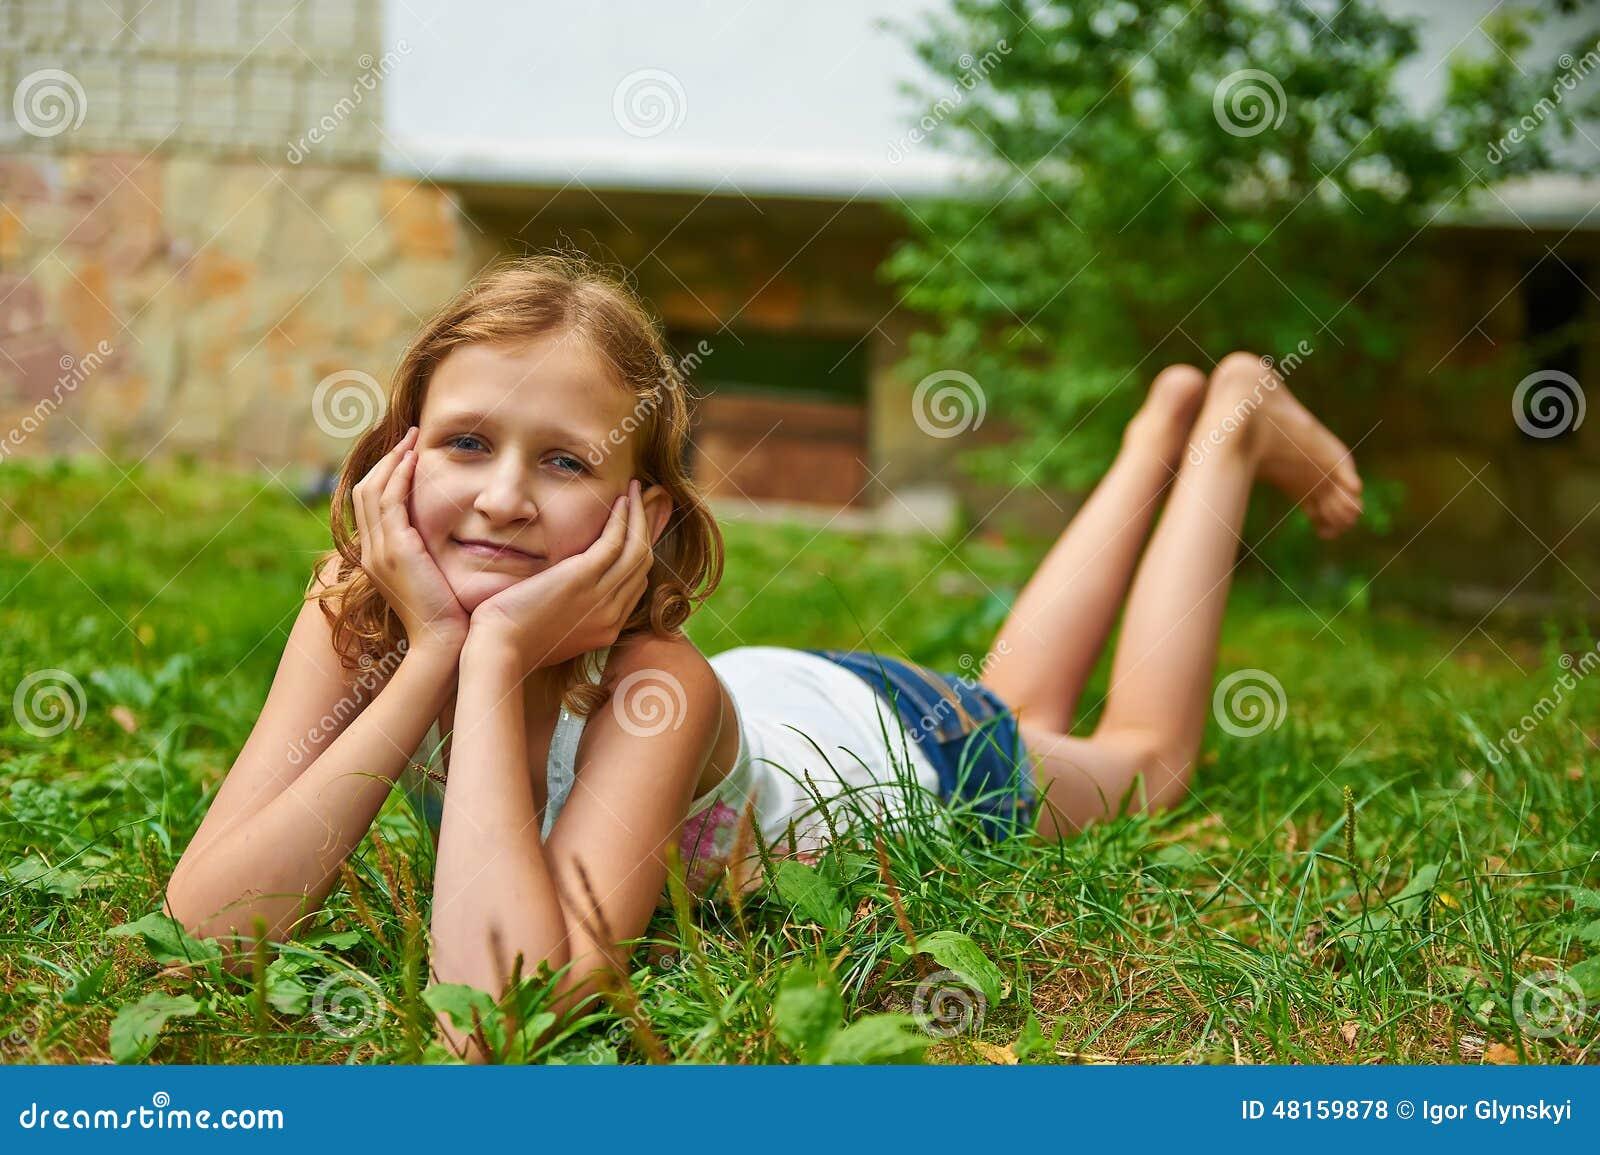 Twelve year olds pictures of Development Milestones